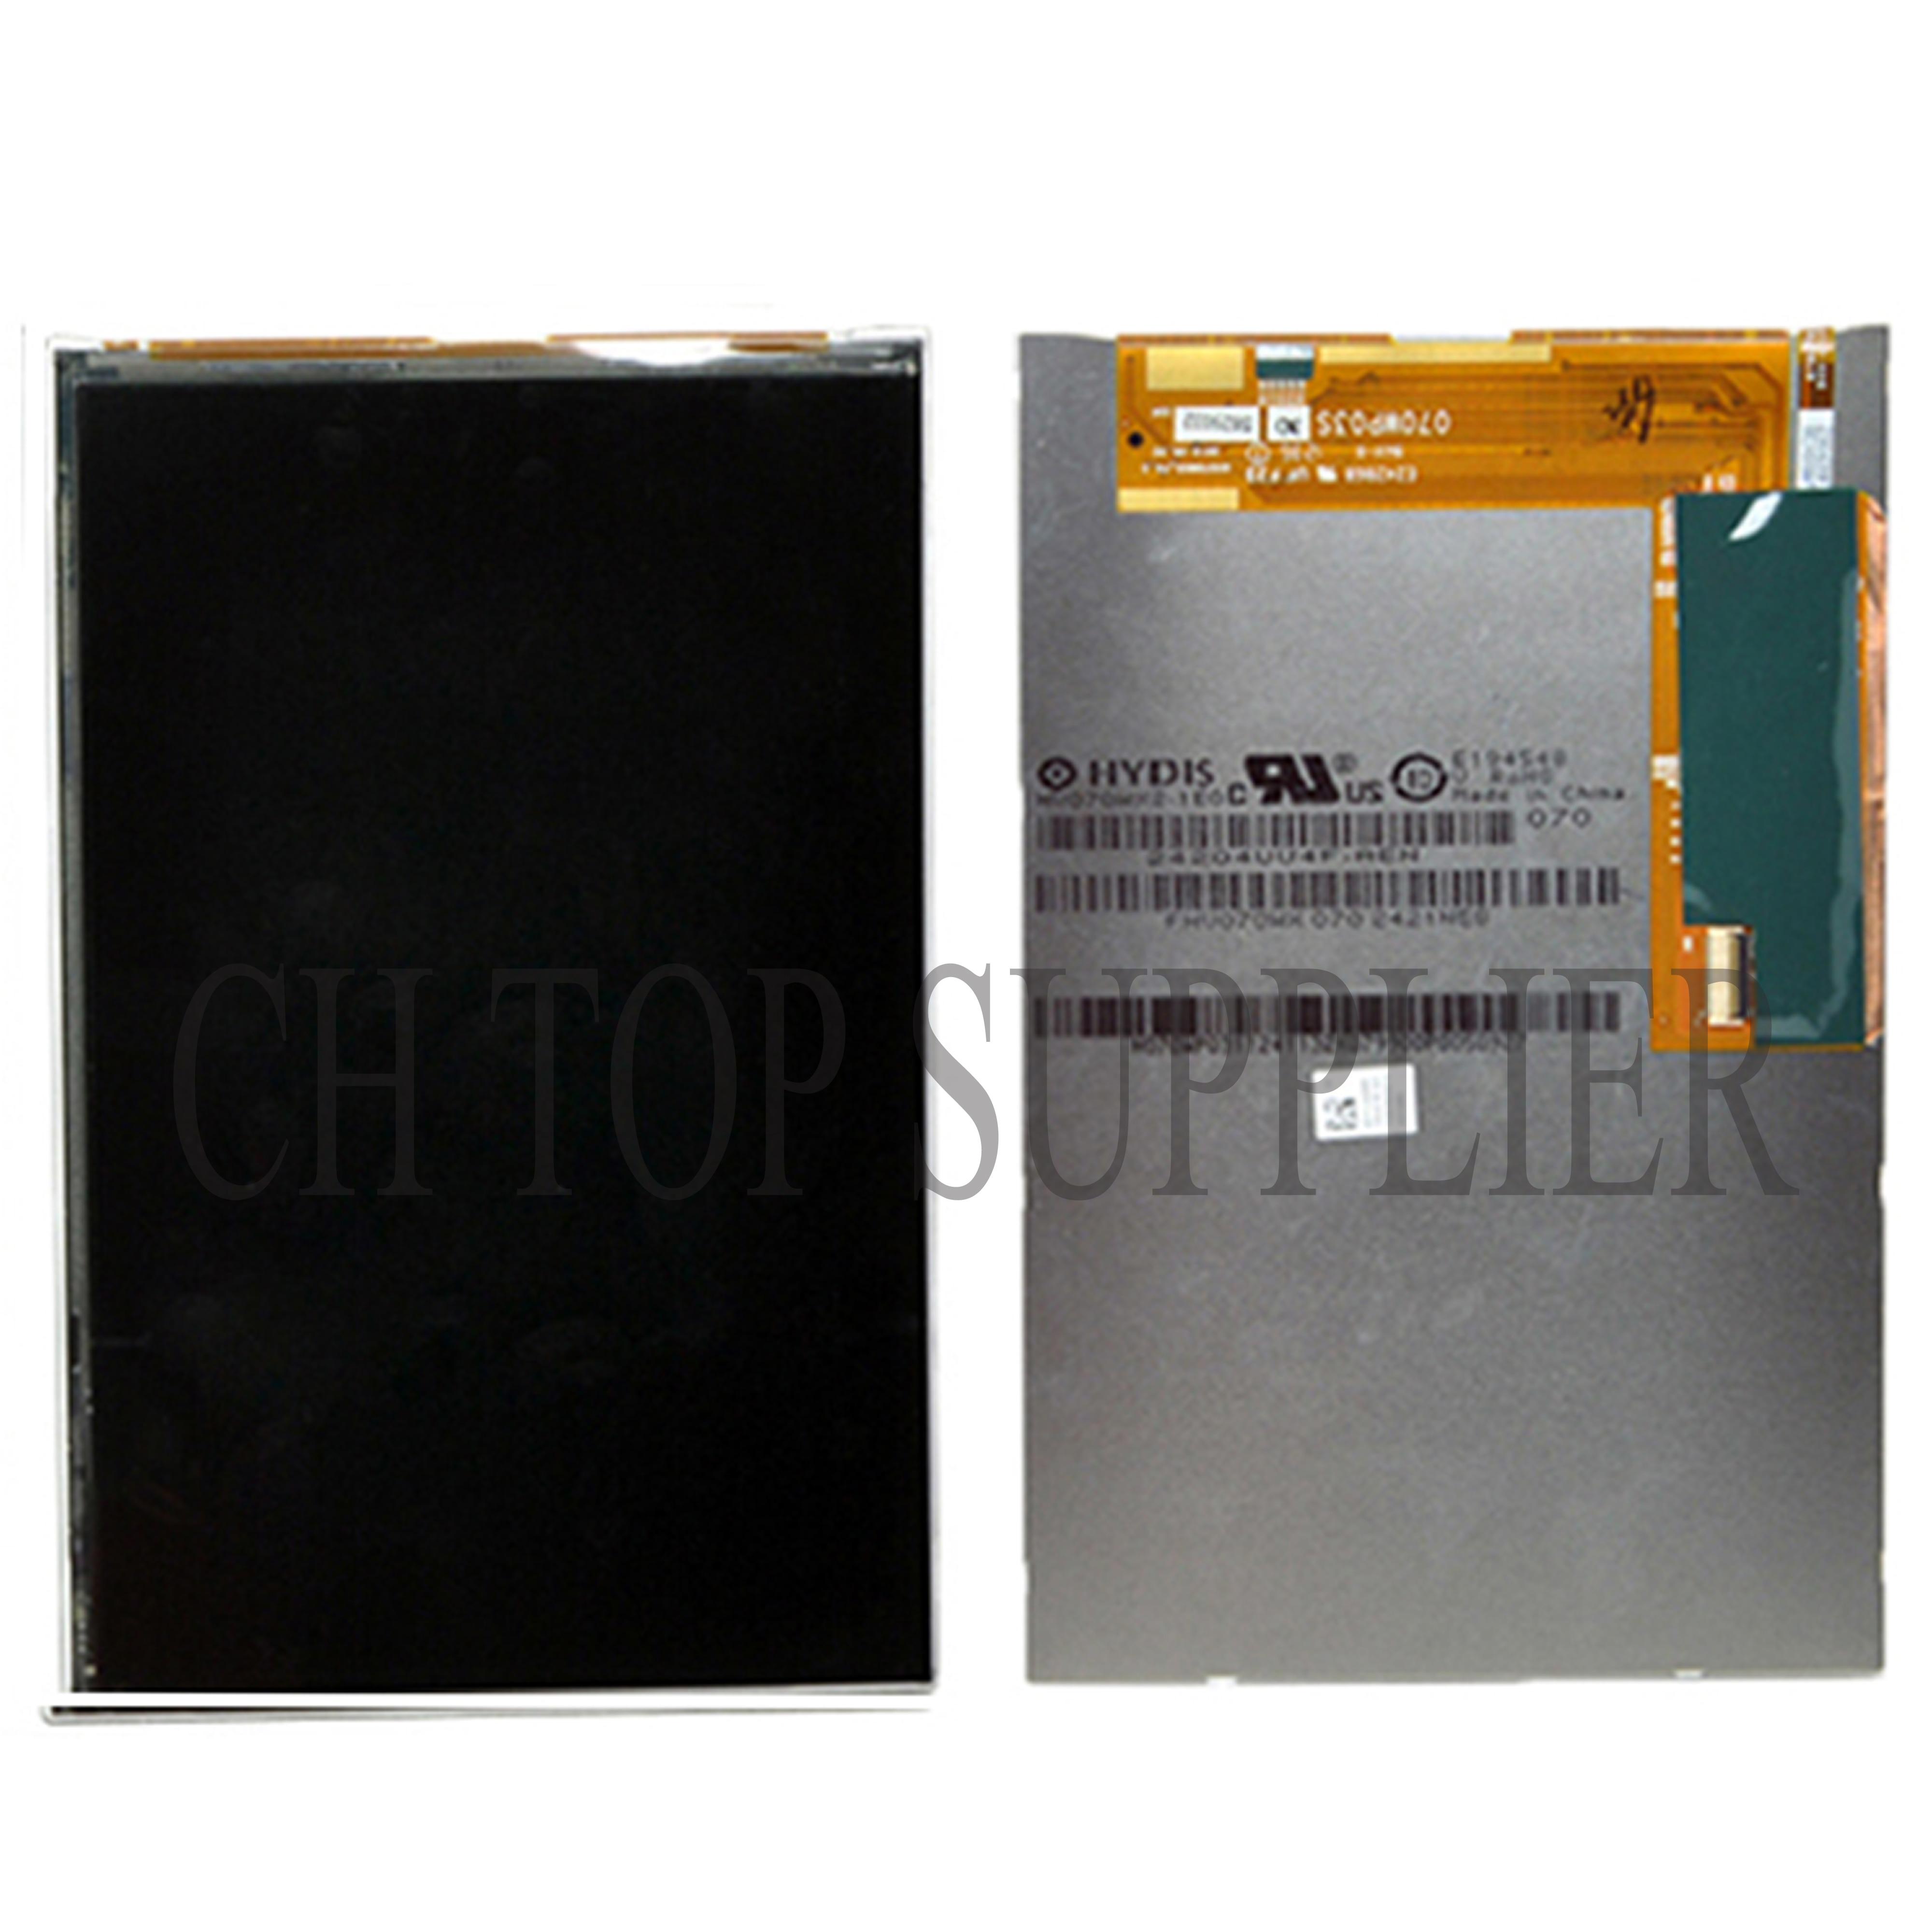 все цены на (Ref:CLAA070WP03 XG/070WP03S)7 inch for Ainol NOVO7 Myth Quad-core JXD S7800 Tablet Display screen ,IPS lcd screen(1280*800) онлайн